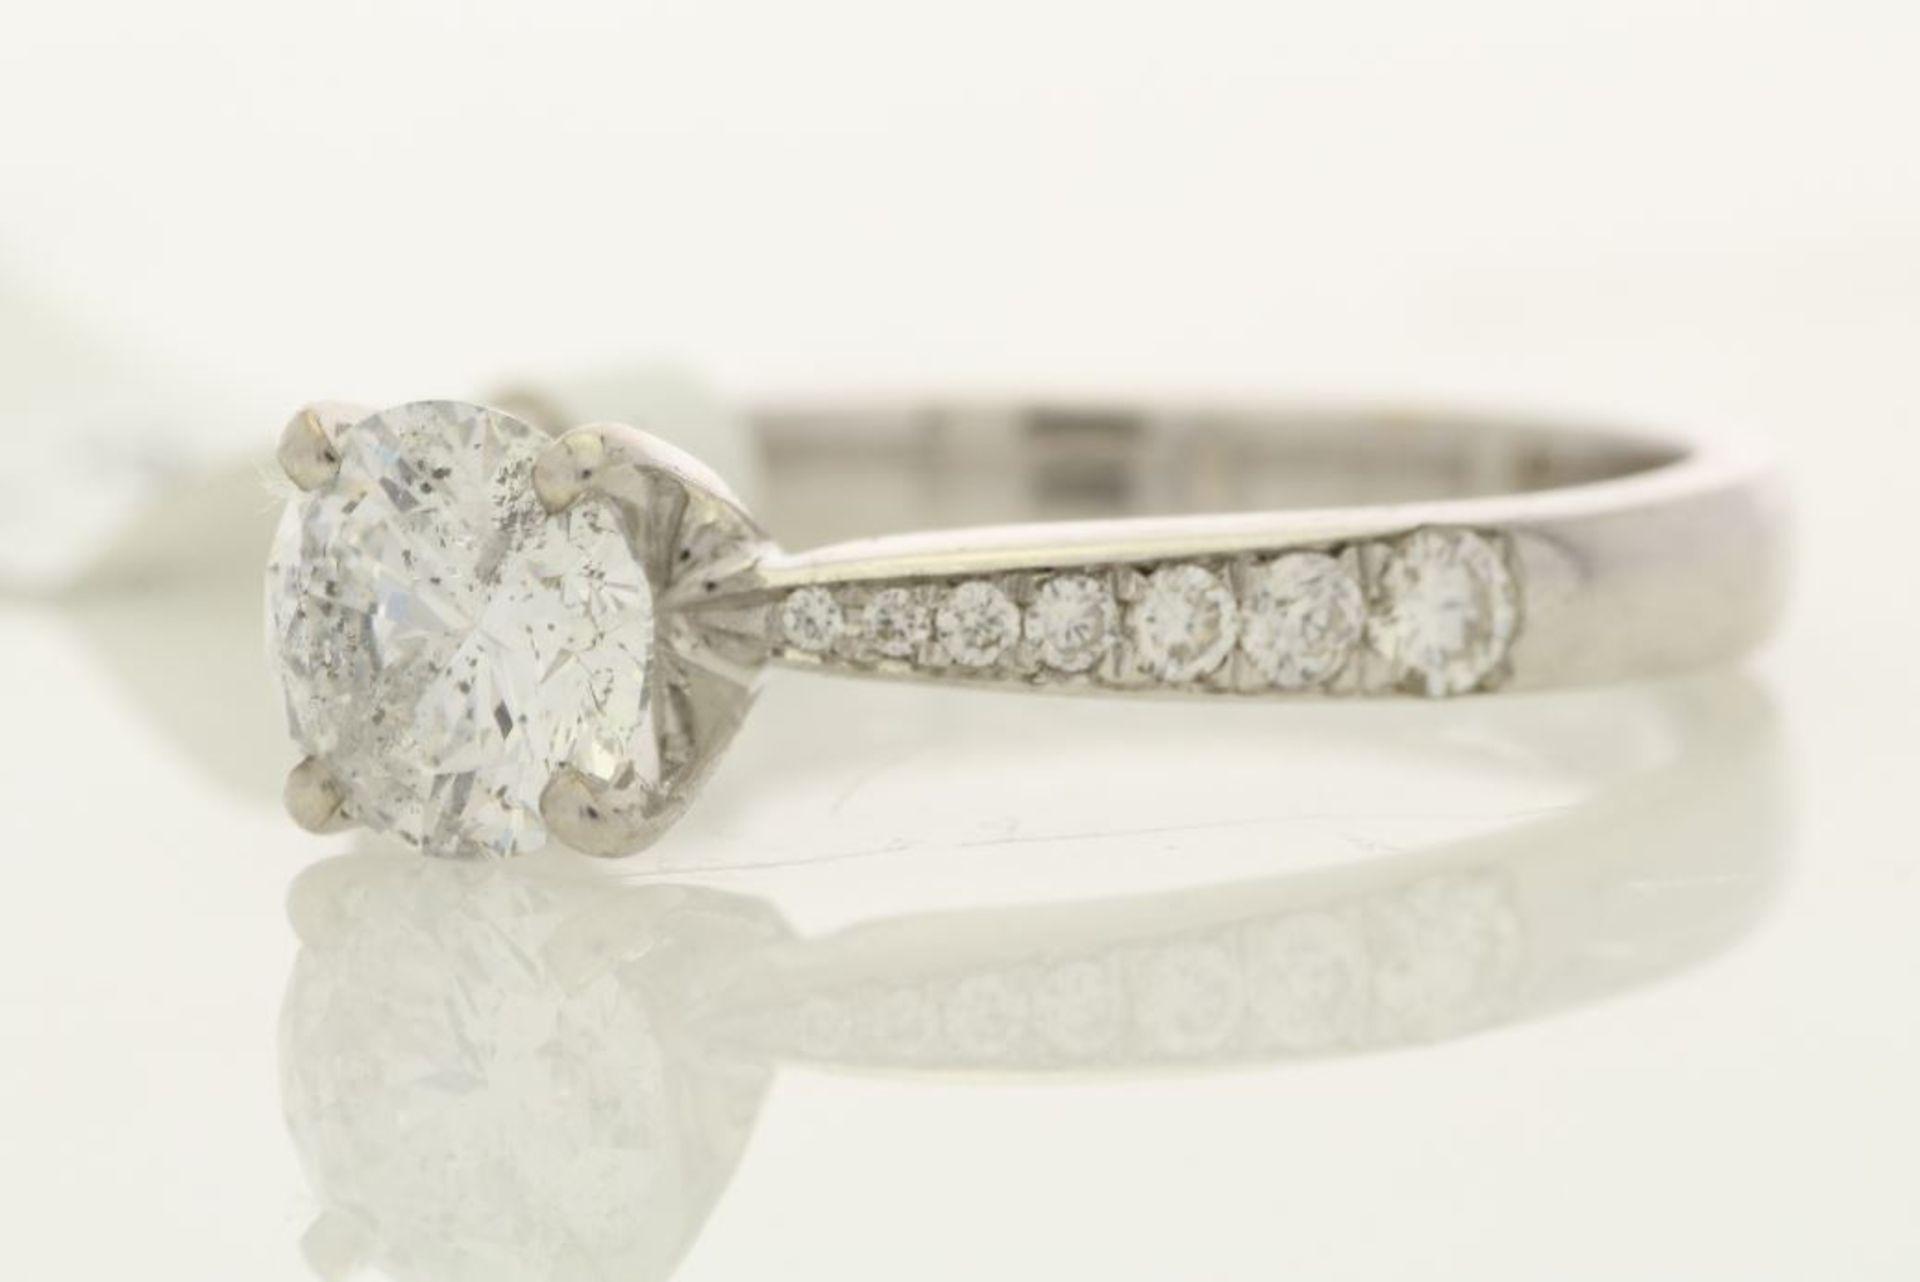 Lot 19 - 18k White Gold Single Stone Prong Set With Stone Set Shoulders Diamond Ring 1.39